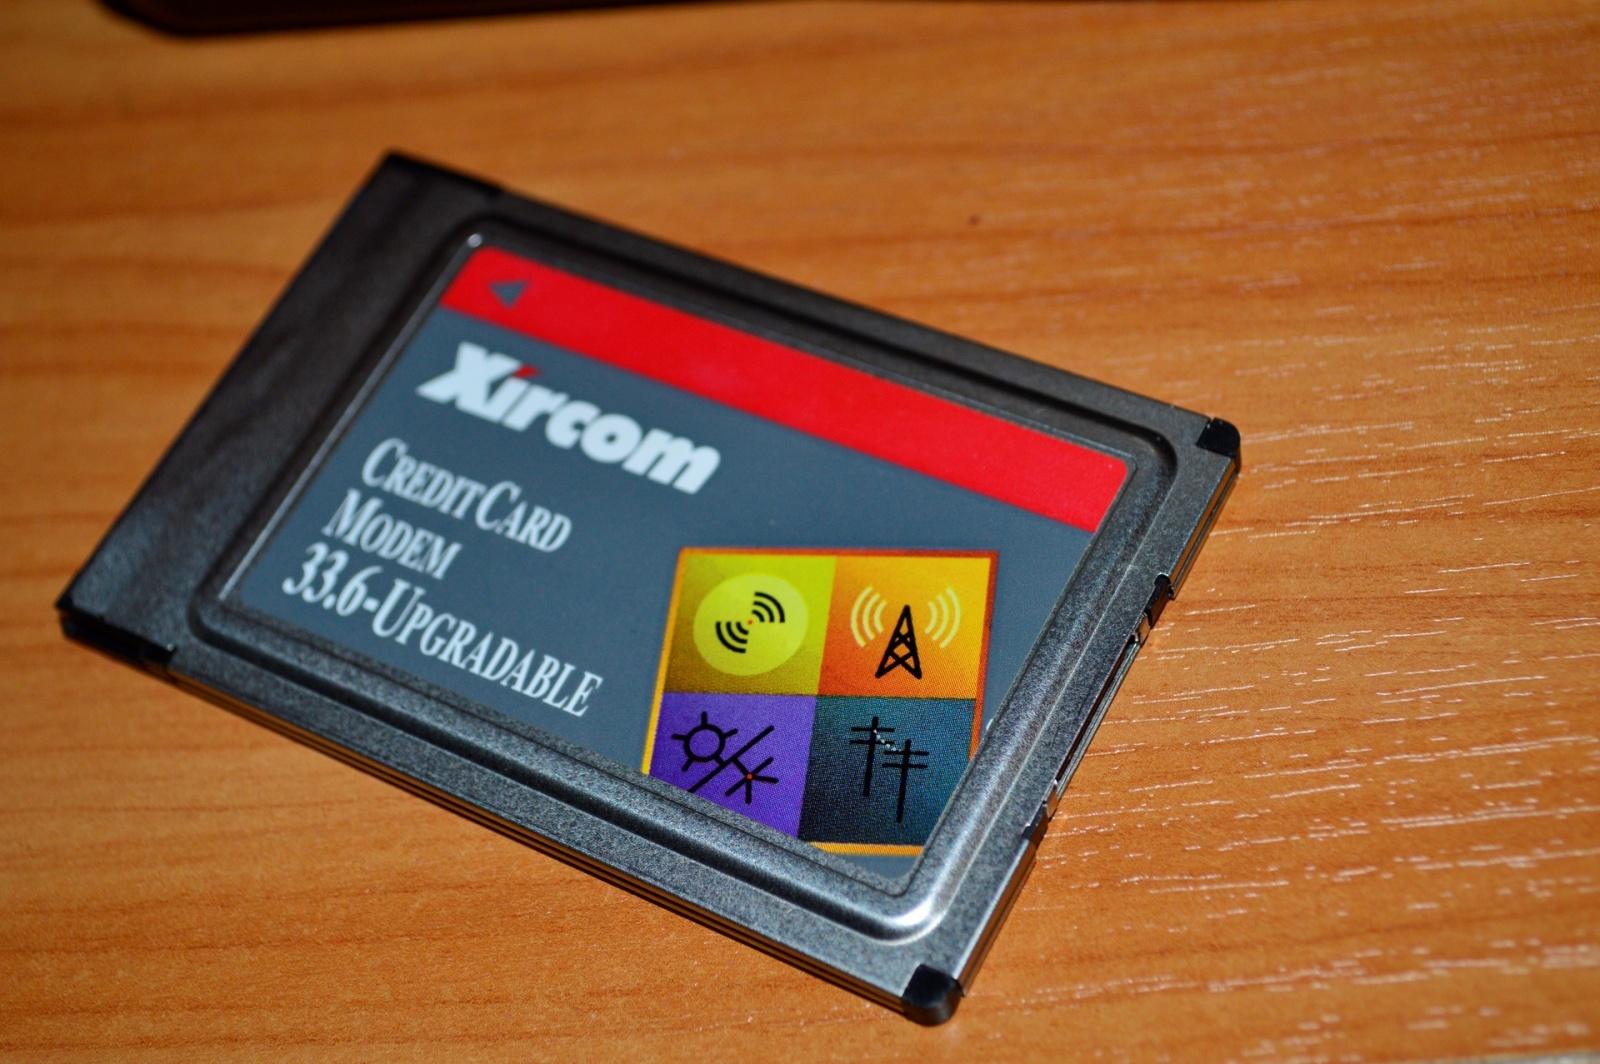 Какими были ноутбуки 20 лет назад на примере Toshiba libretto 100ct - 15